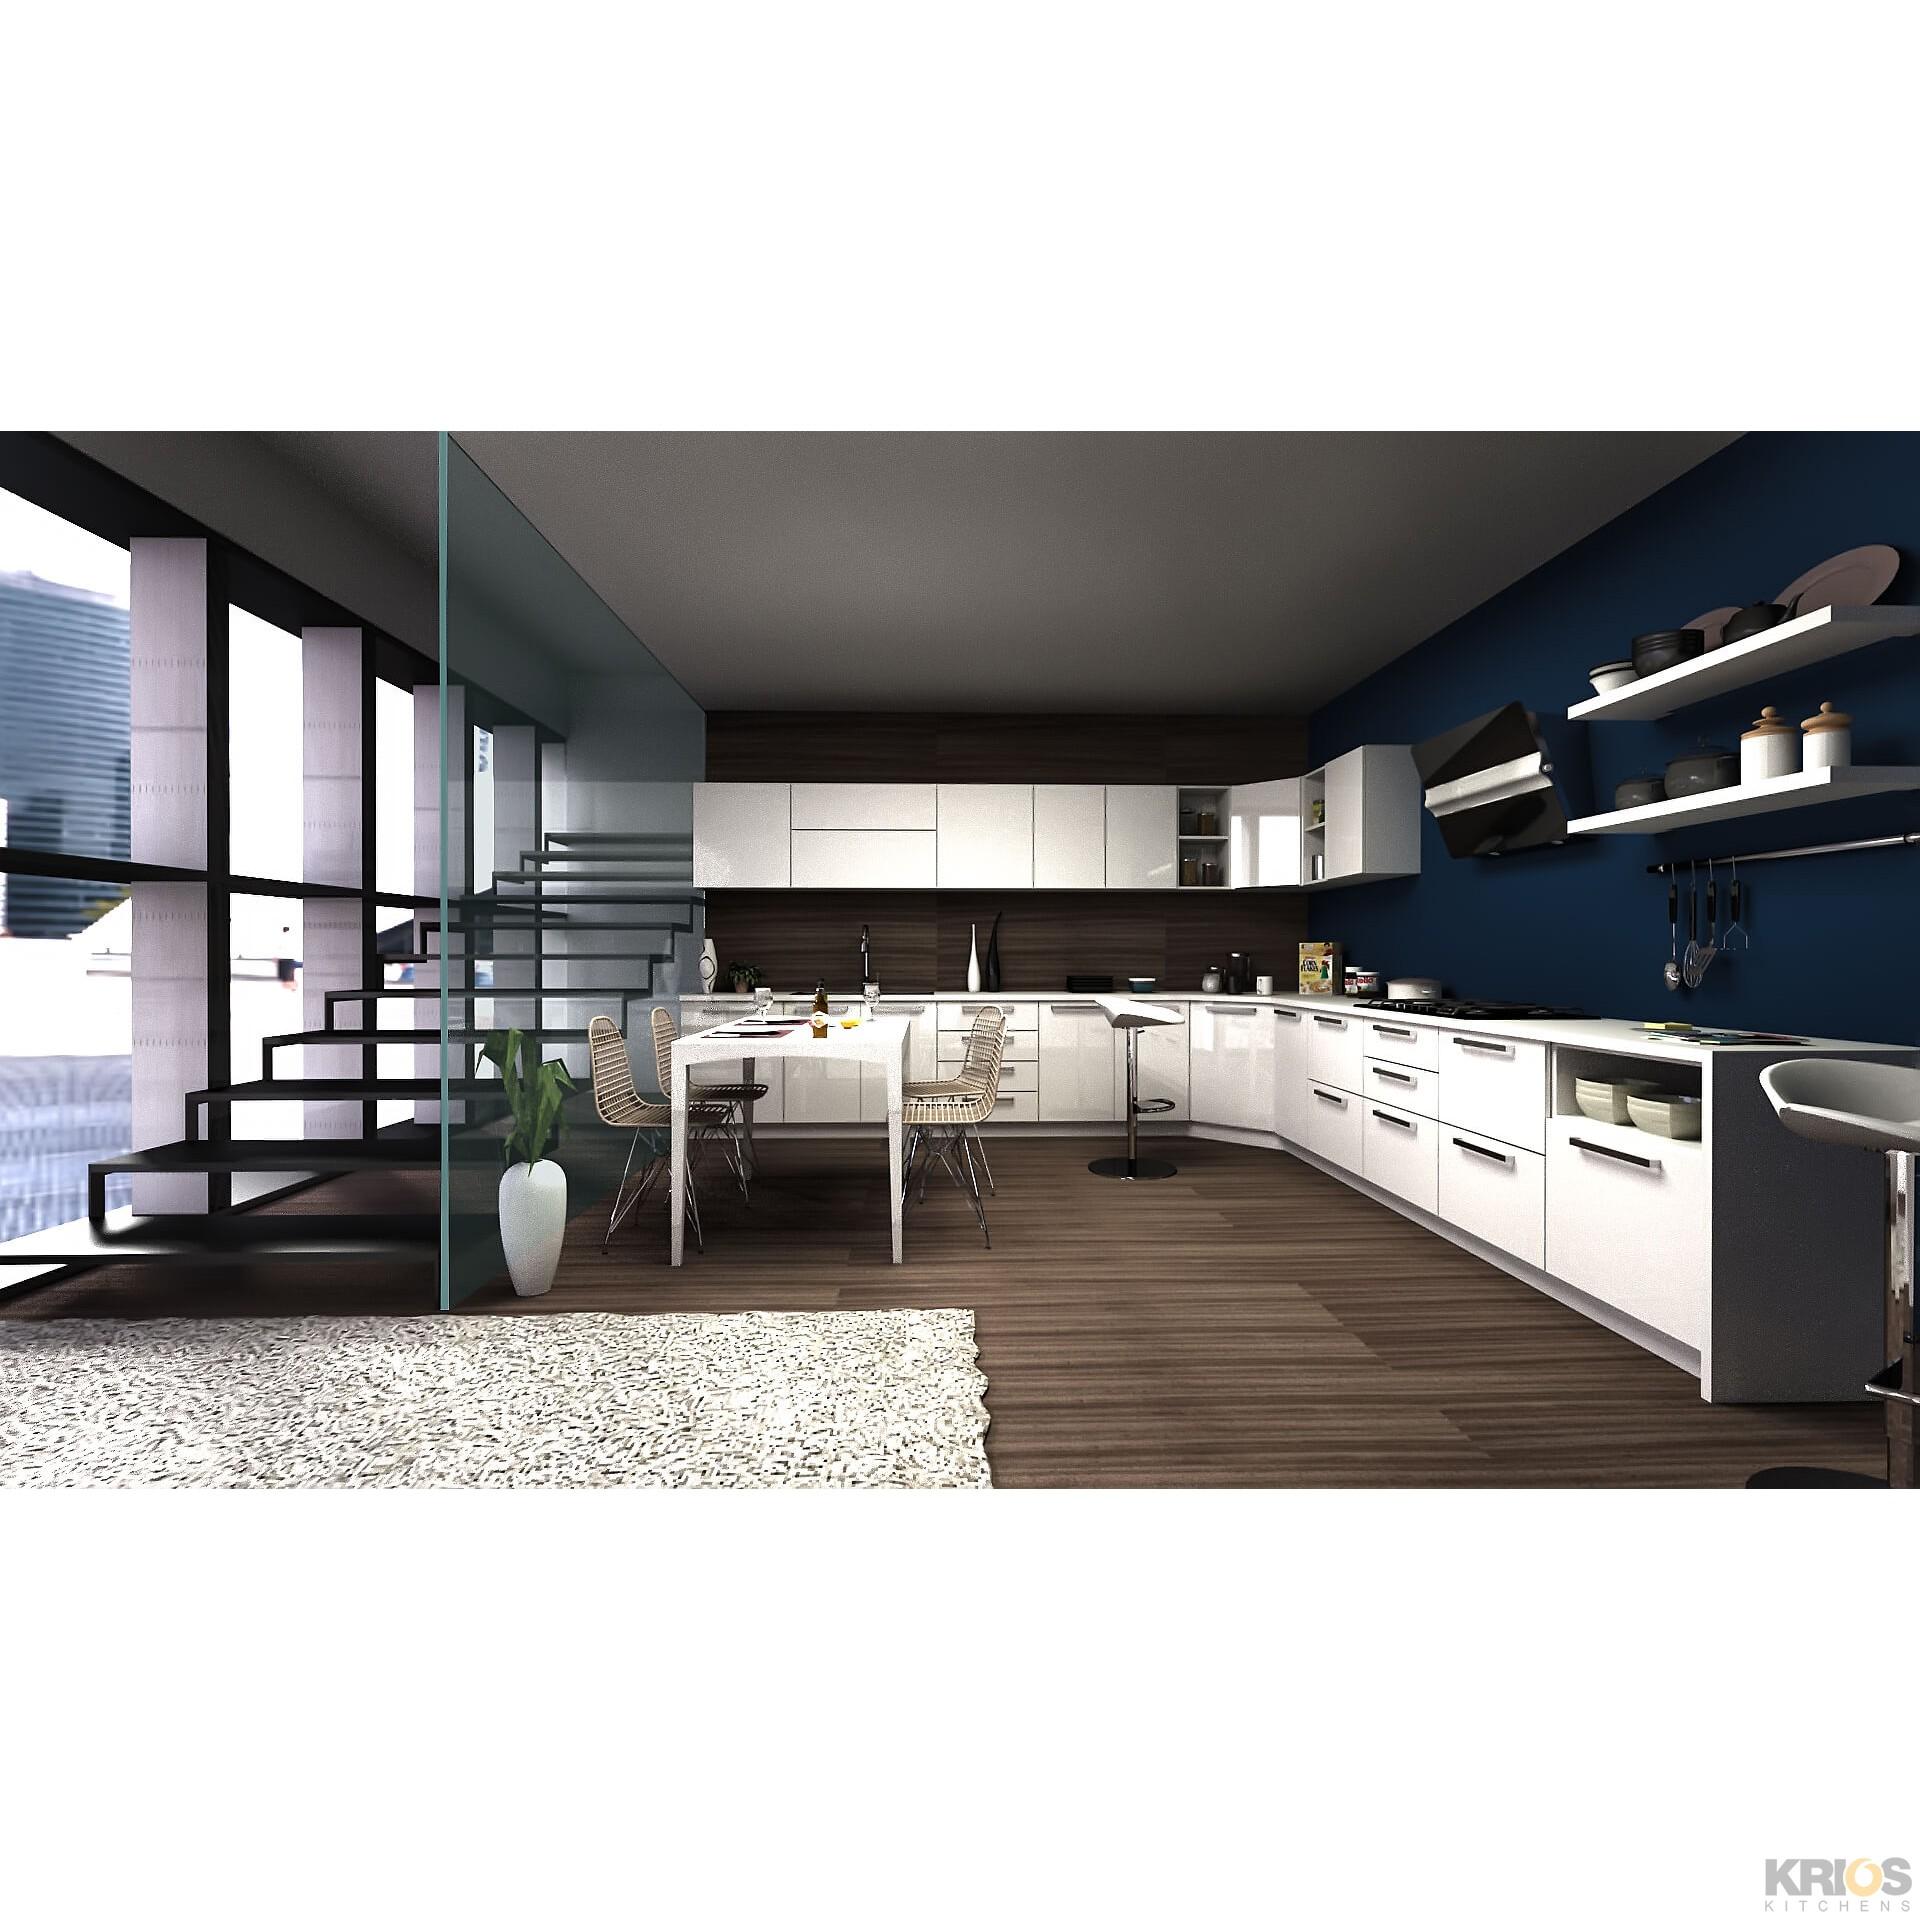 L Shaped Modular Kitchen Designs Catalogue: Modular Kitchens